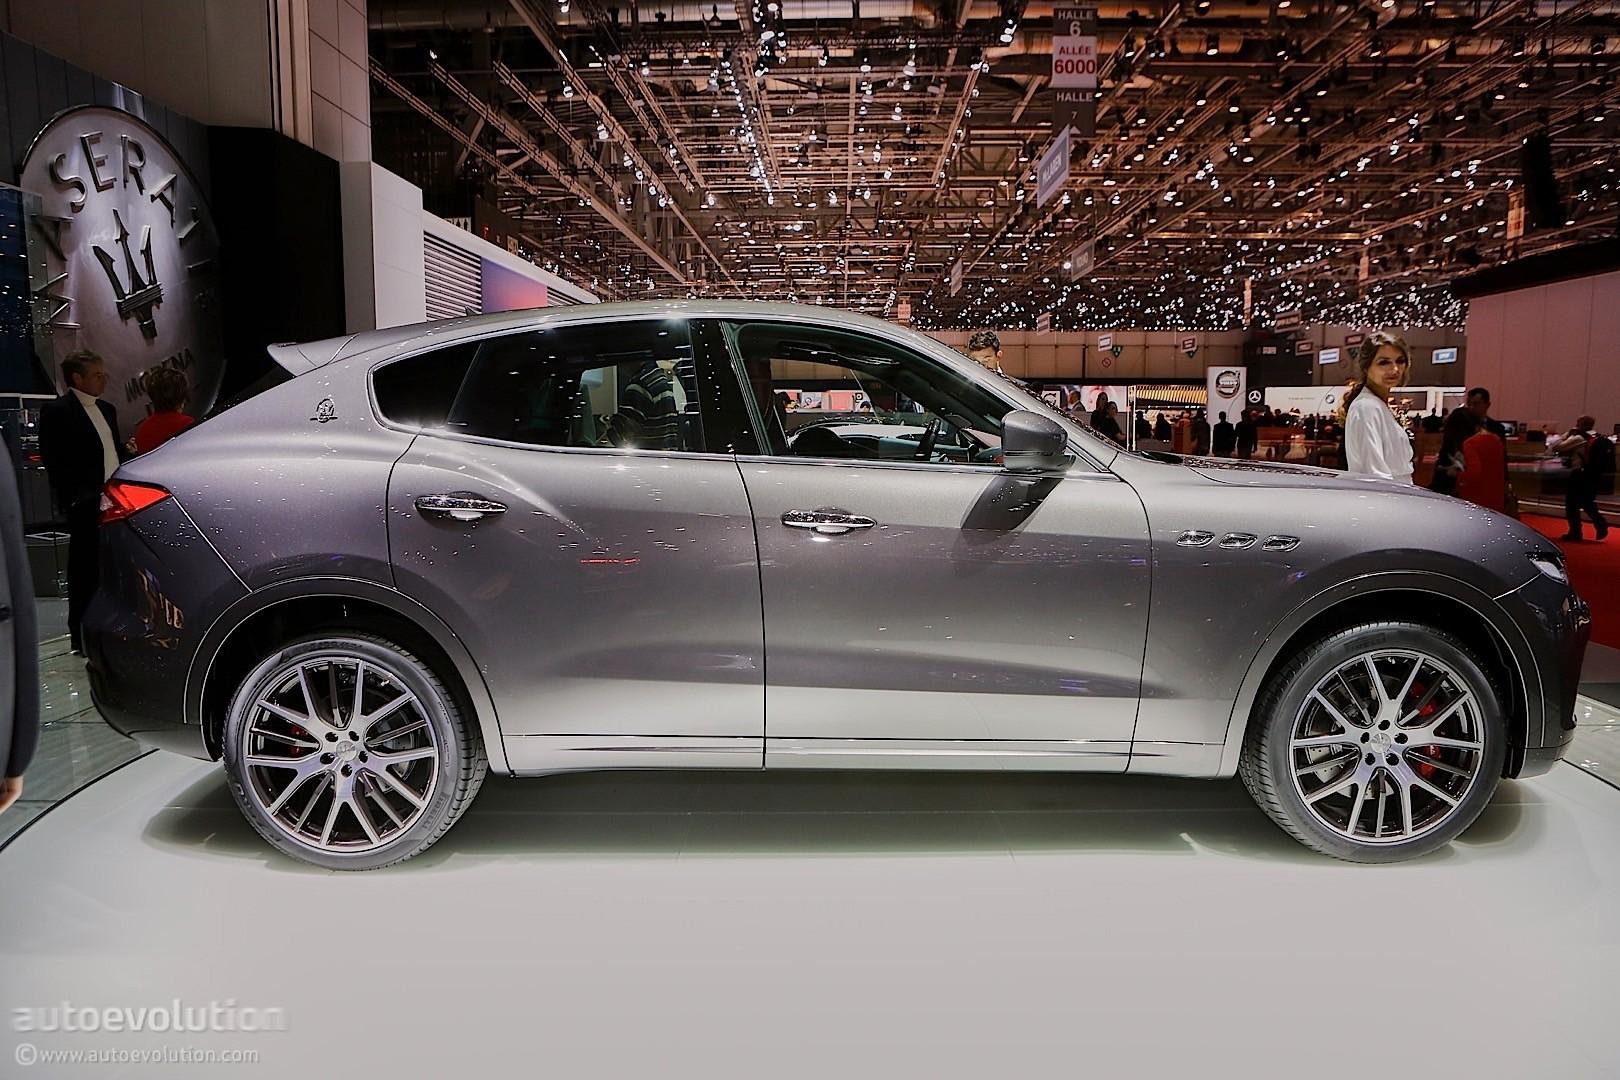 Maserati Ghibli Price >> Maserati Levante SUV Looks like a Ghibli on Stilts in ...